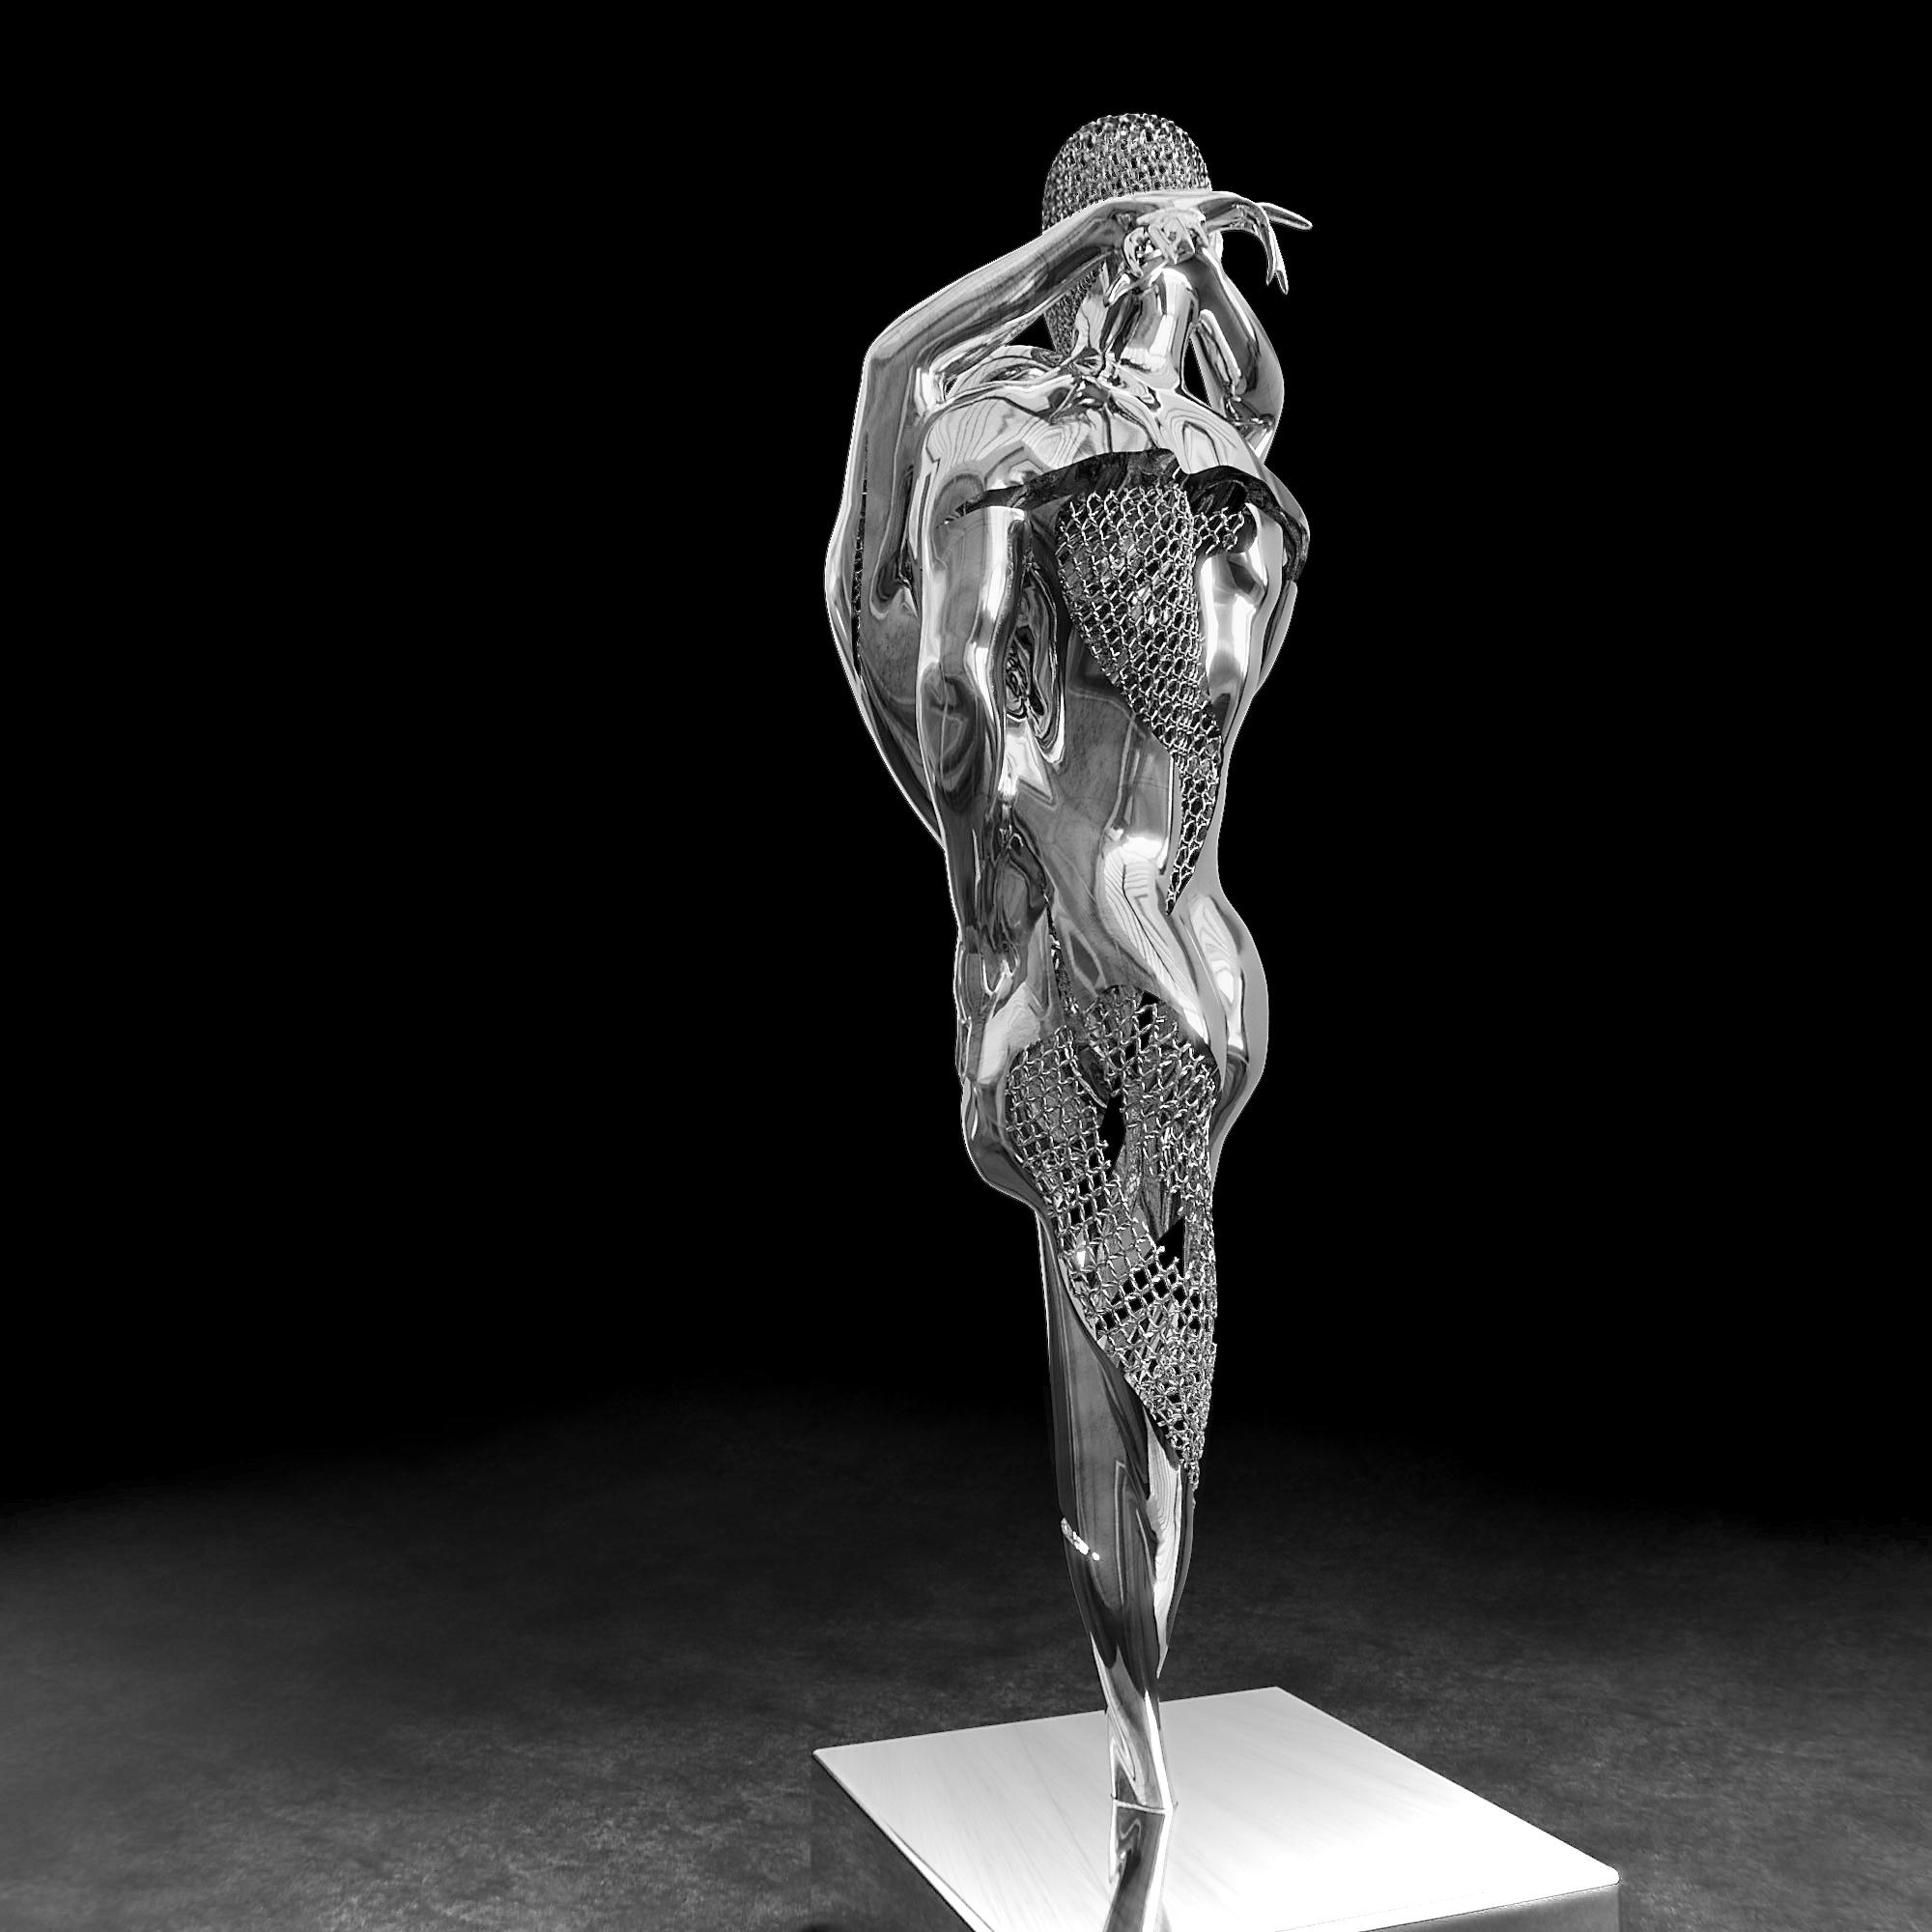 KUMAN | Œuvres d'art - Union